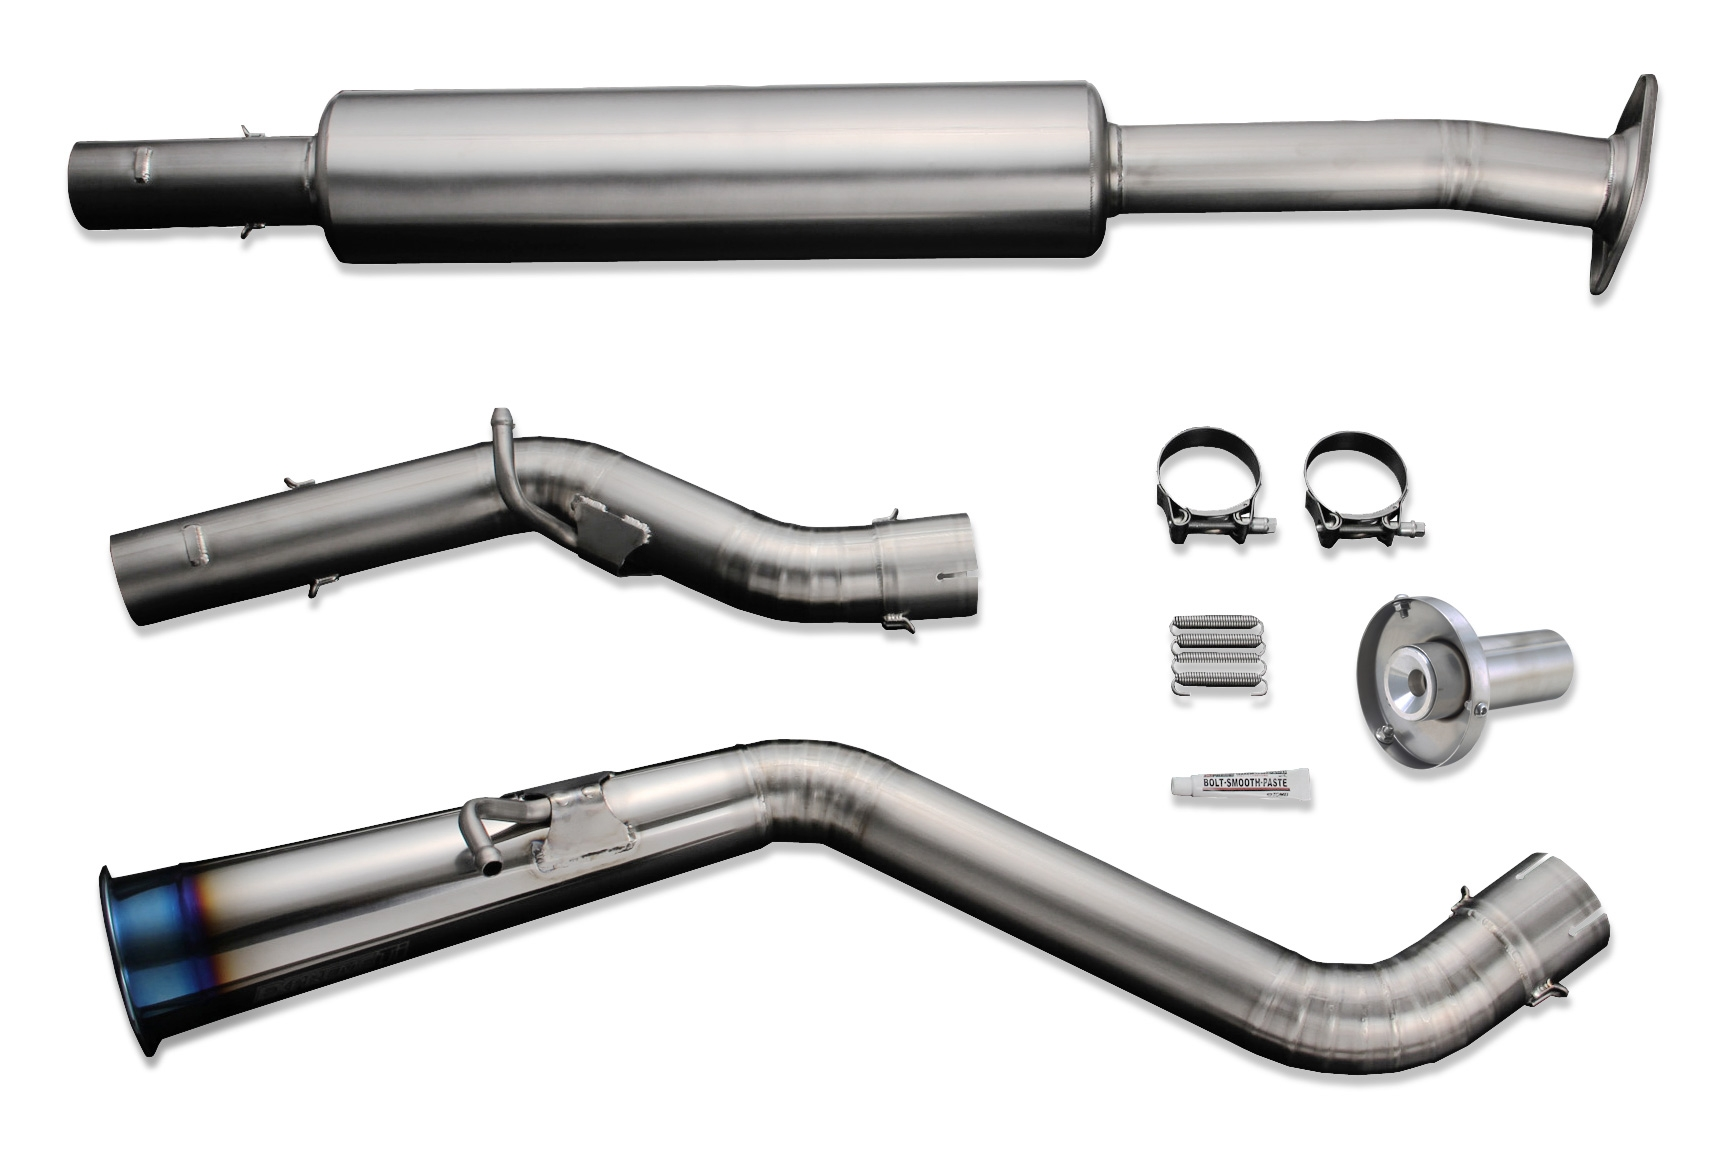 Tomei Expreme Ti Full Titanium Cat-Back Exhaust System, Type 60R - Scion  FR-S 13+, Subaru BRZ 13+, Toyota 86 17+ ZN6 / ZC6 TB6090-SB03B - Concept Z